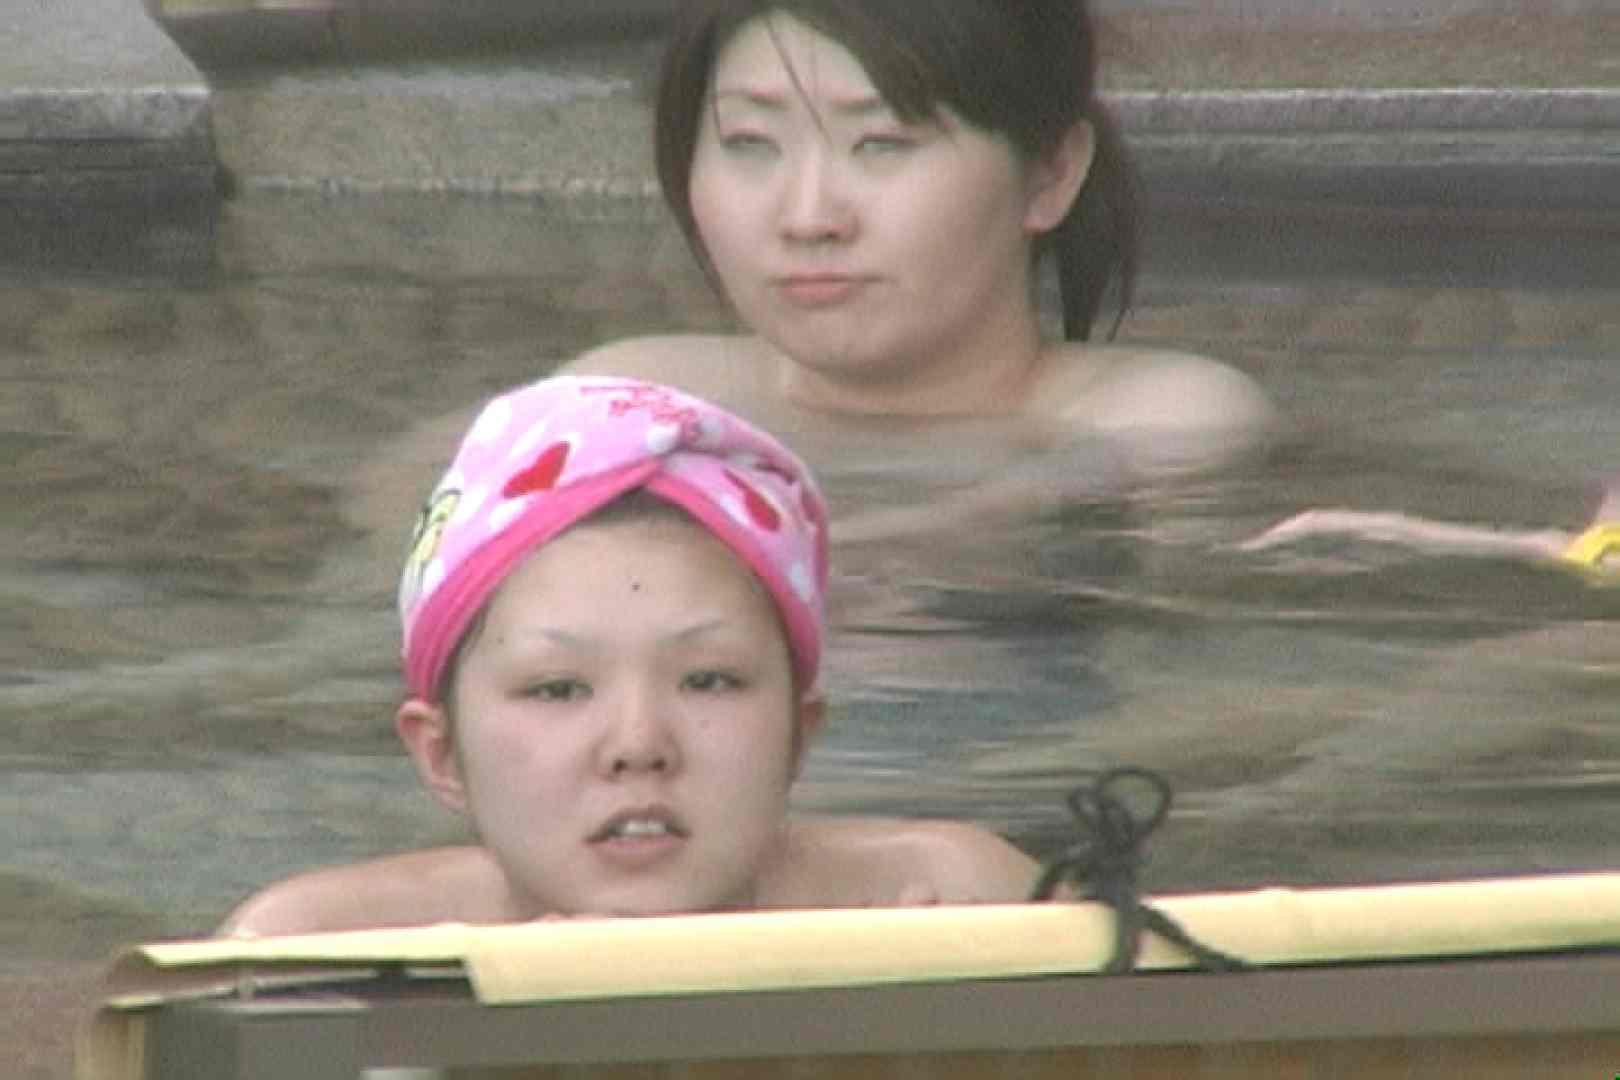 Aquaな露天風呂Vol.25 美しいOLの裸体 おまんこ無修正動画無料 72pic 38